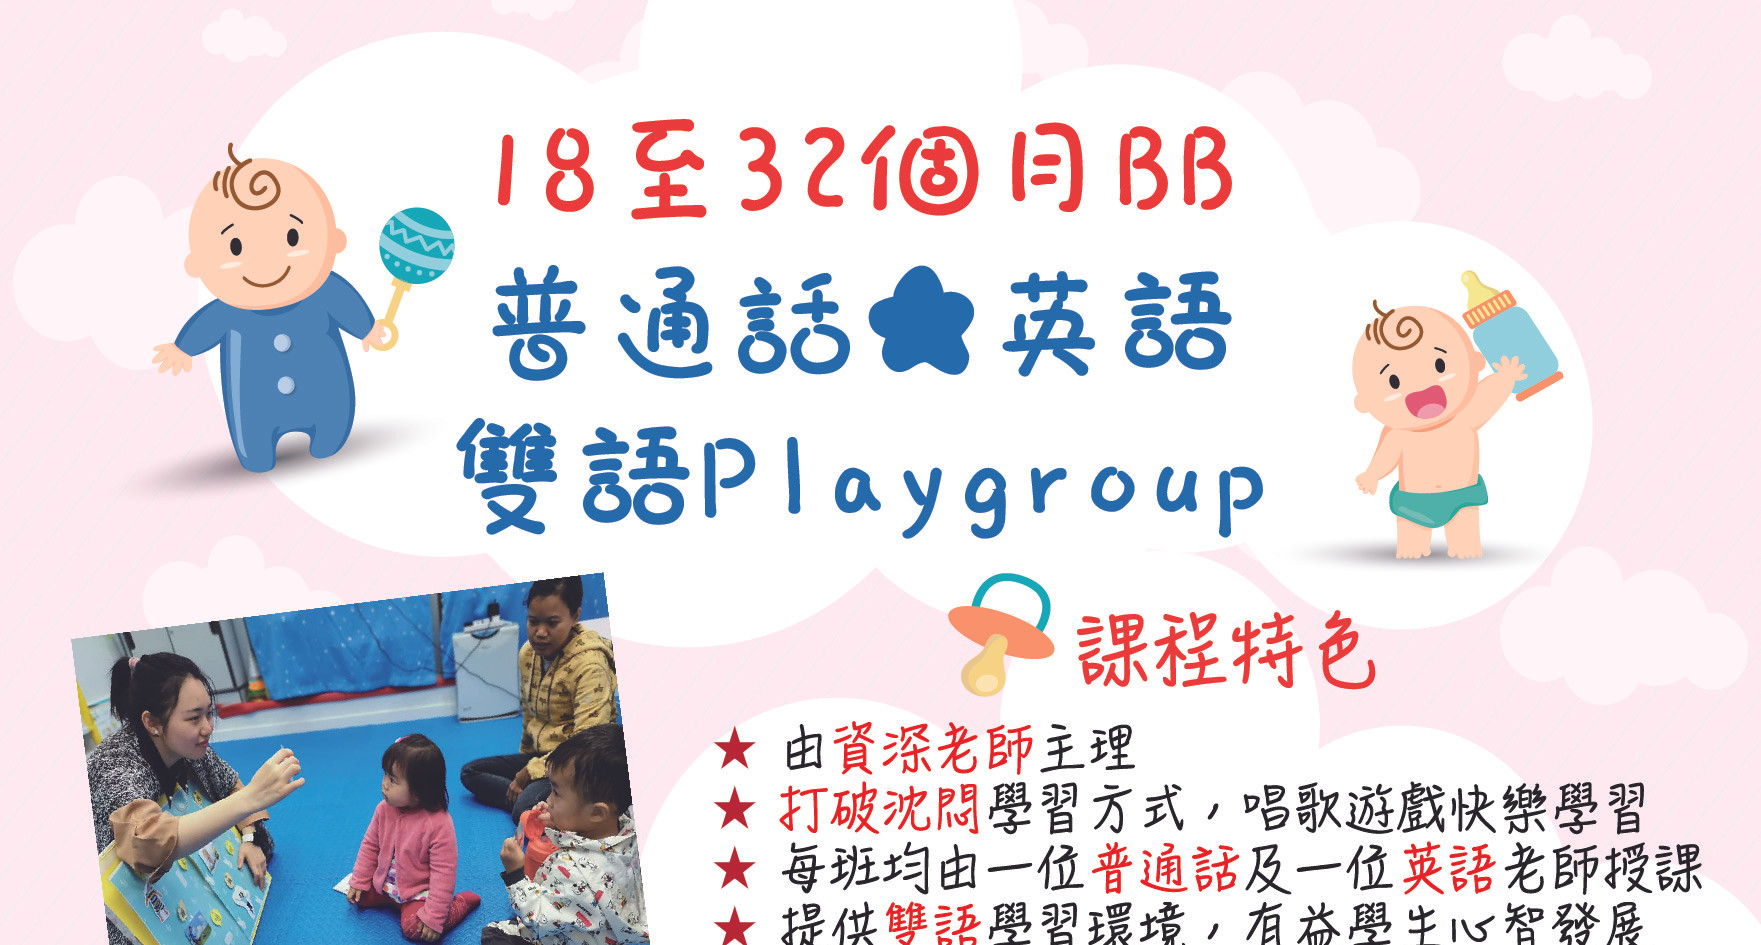 2020 Sept Playgroup_工作區域 1.jpg